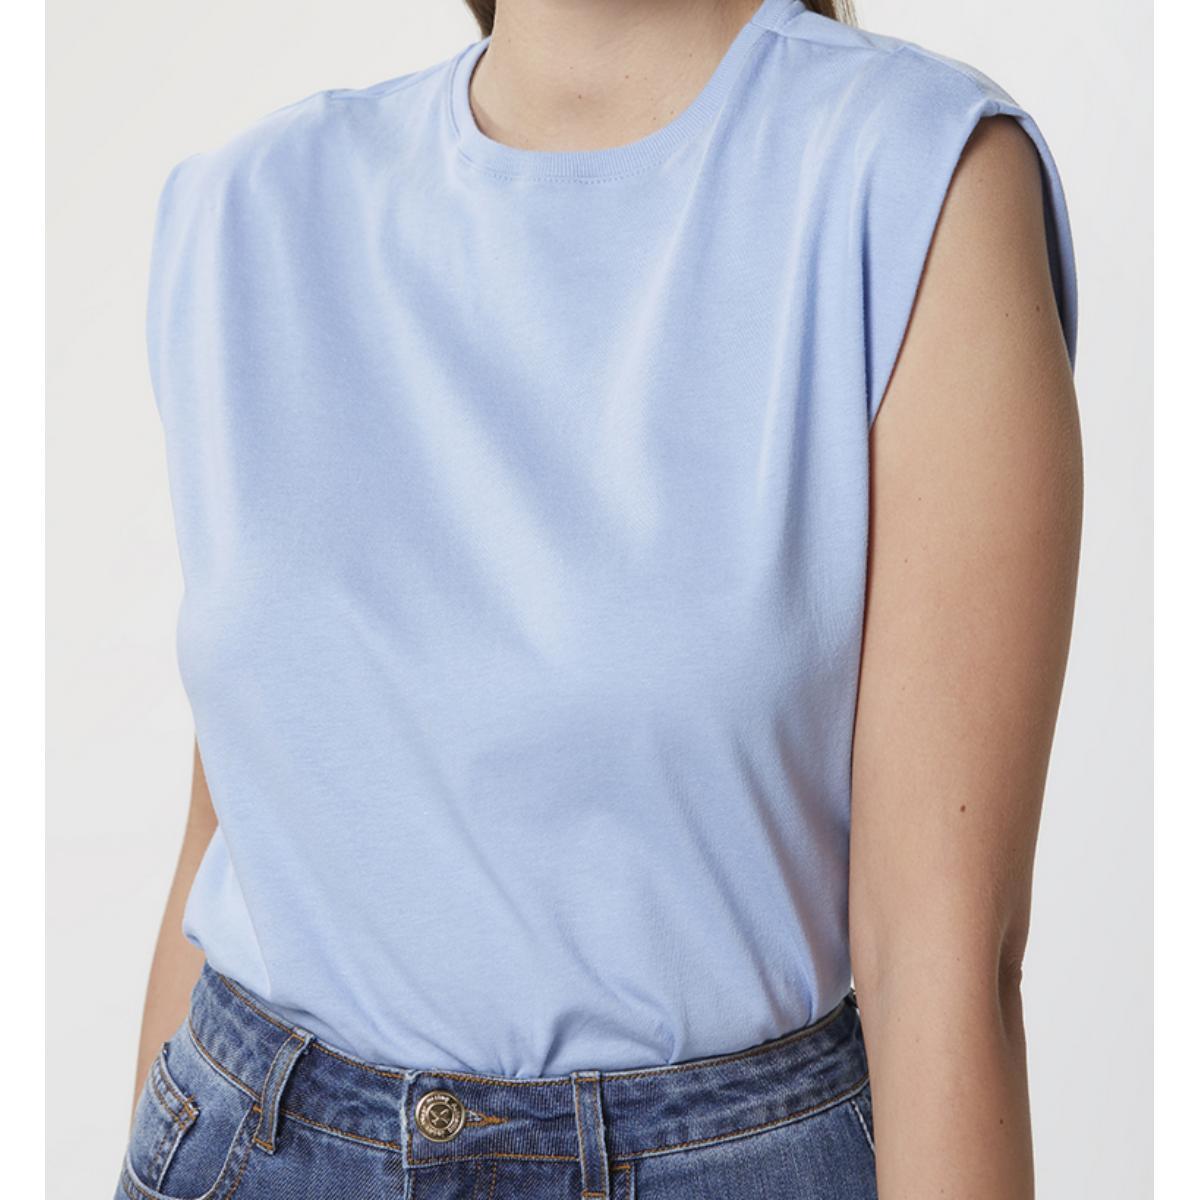 Blusa Feminina Hering 4ae1 Az8en Azul Claro